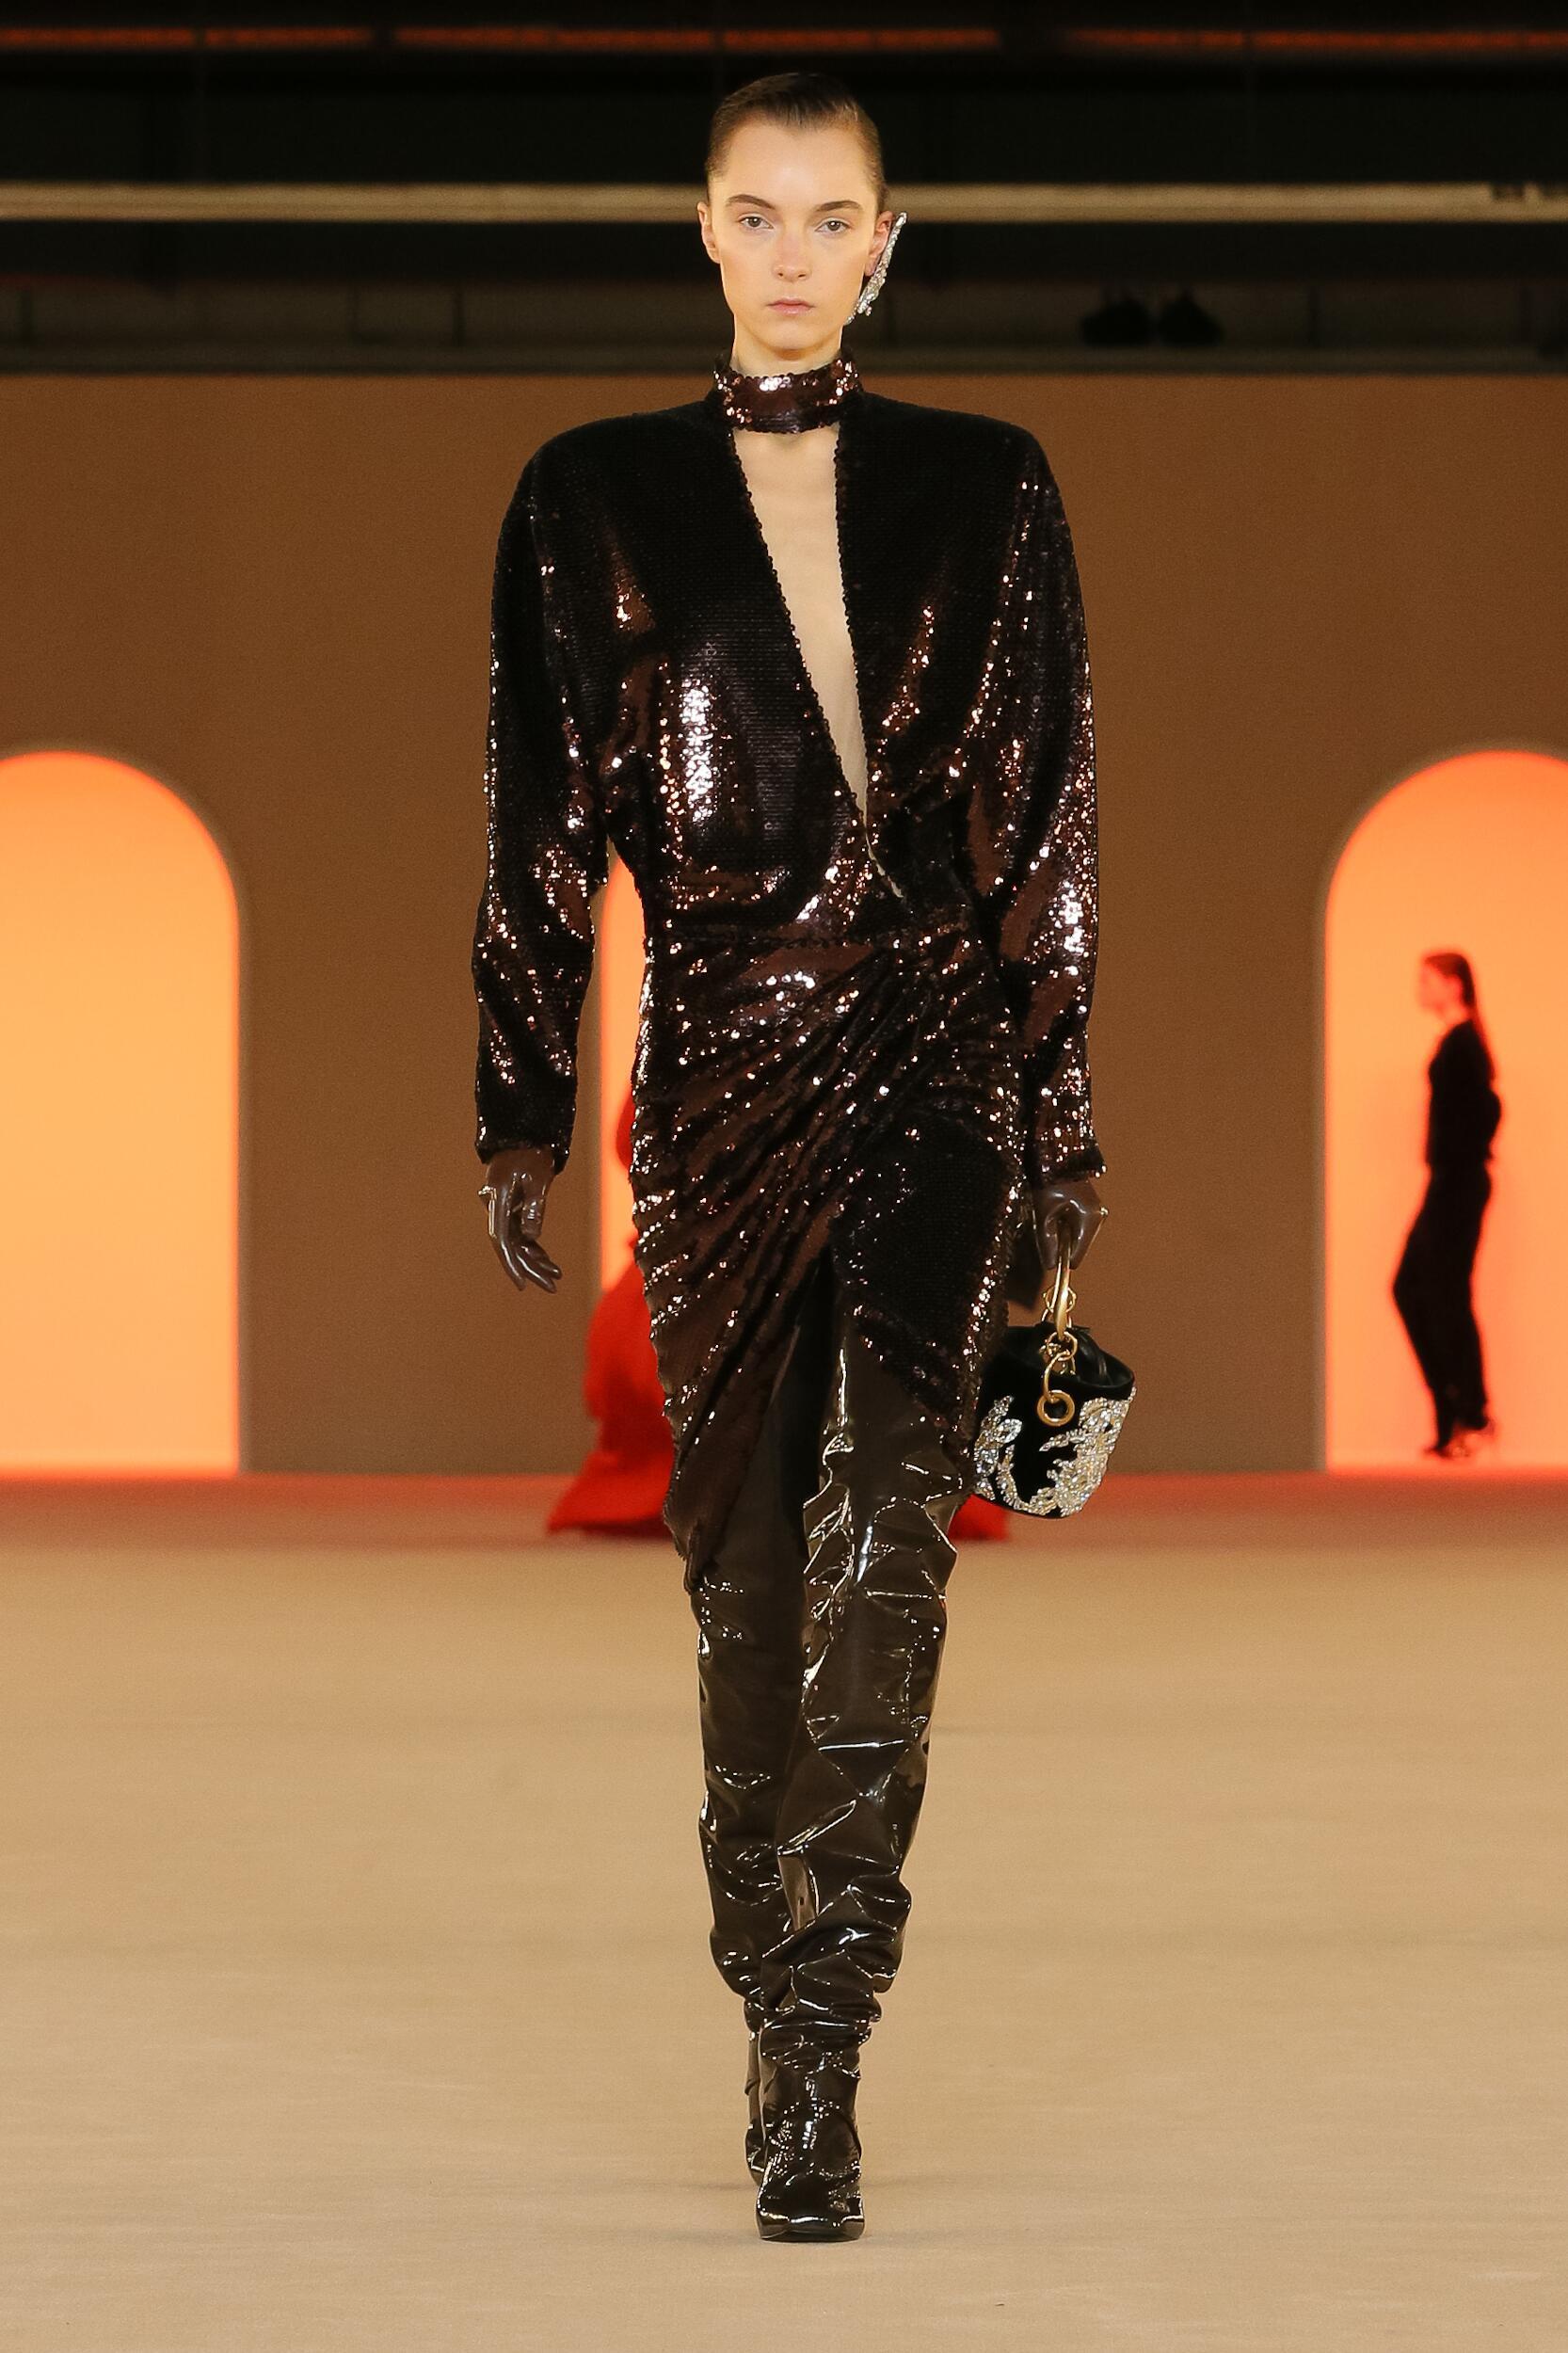 FW 2020 Balmain Show Paris Fashion Week